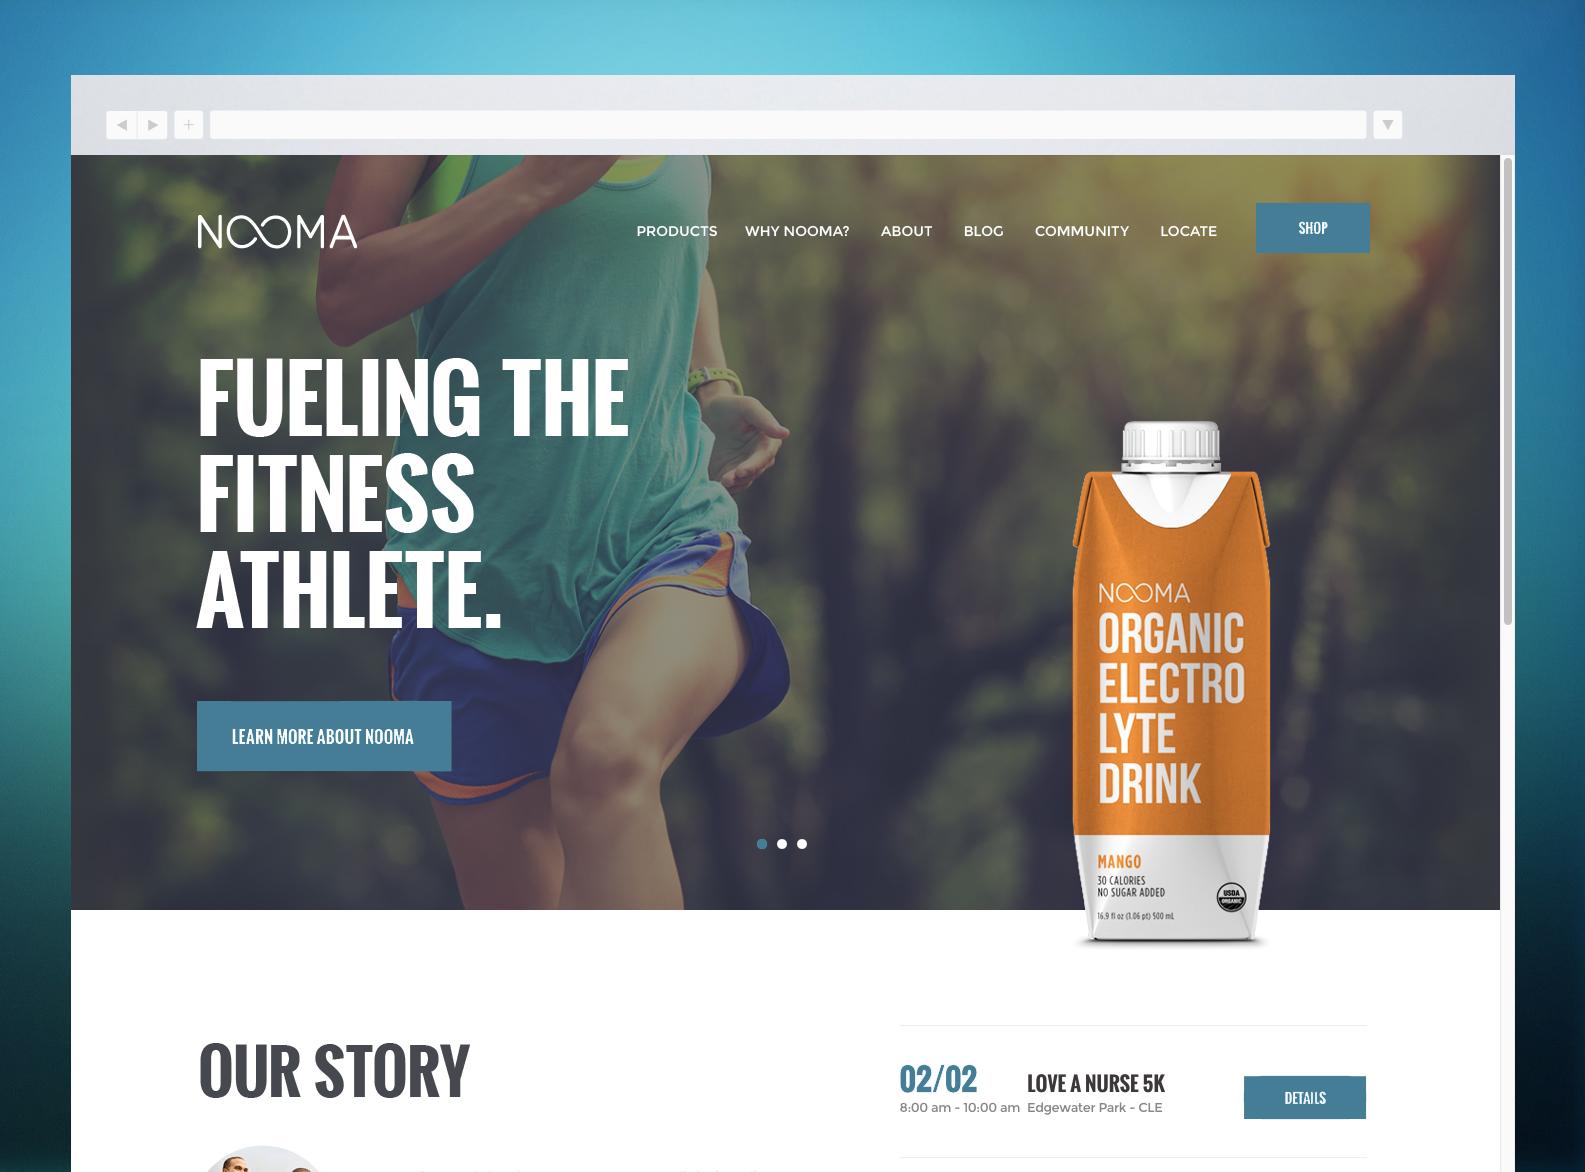 NOOMA Website